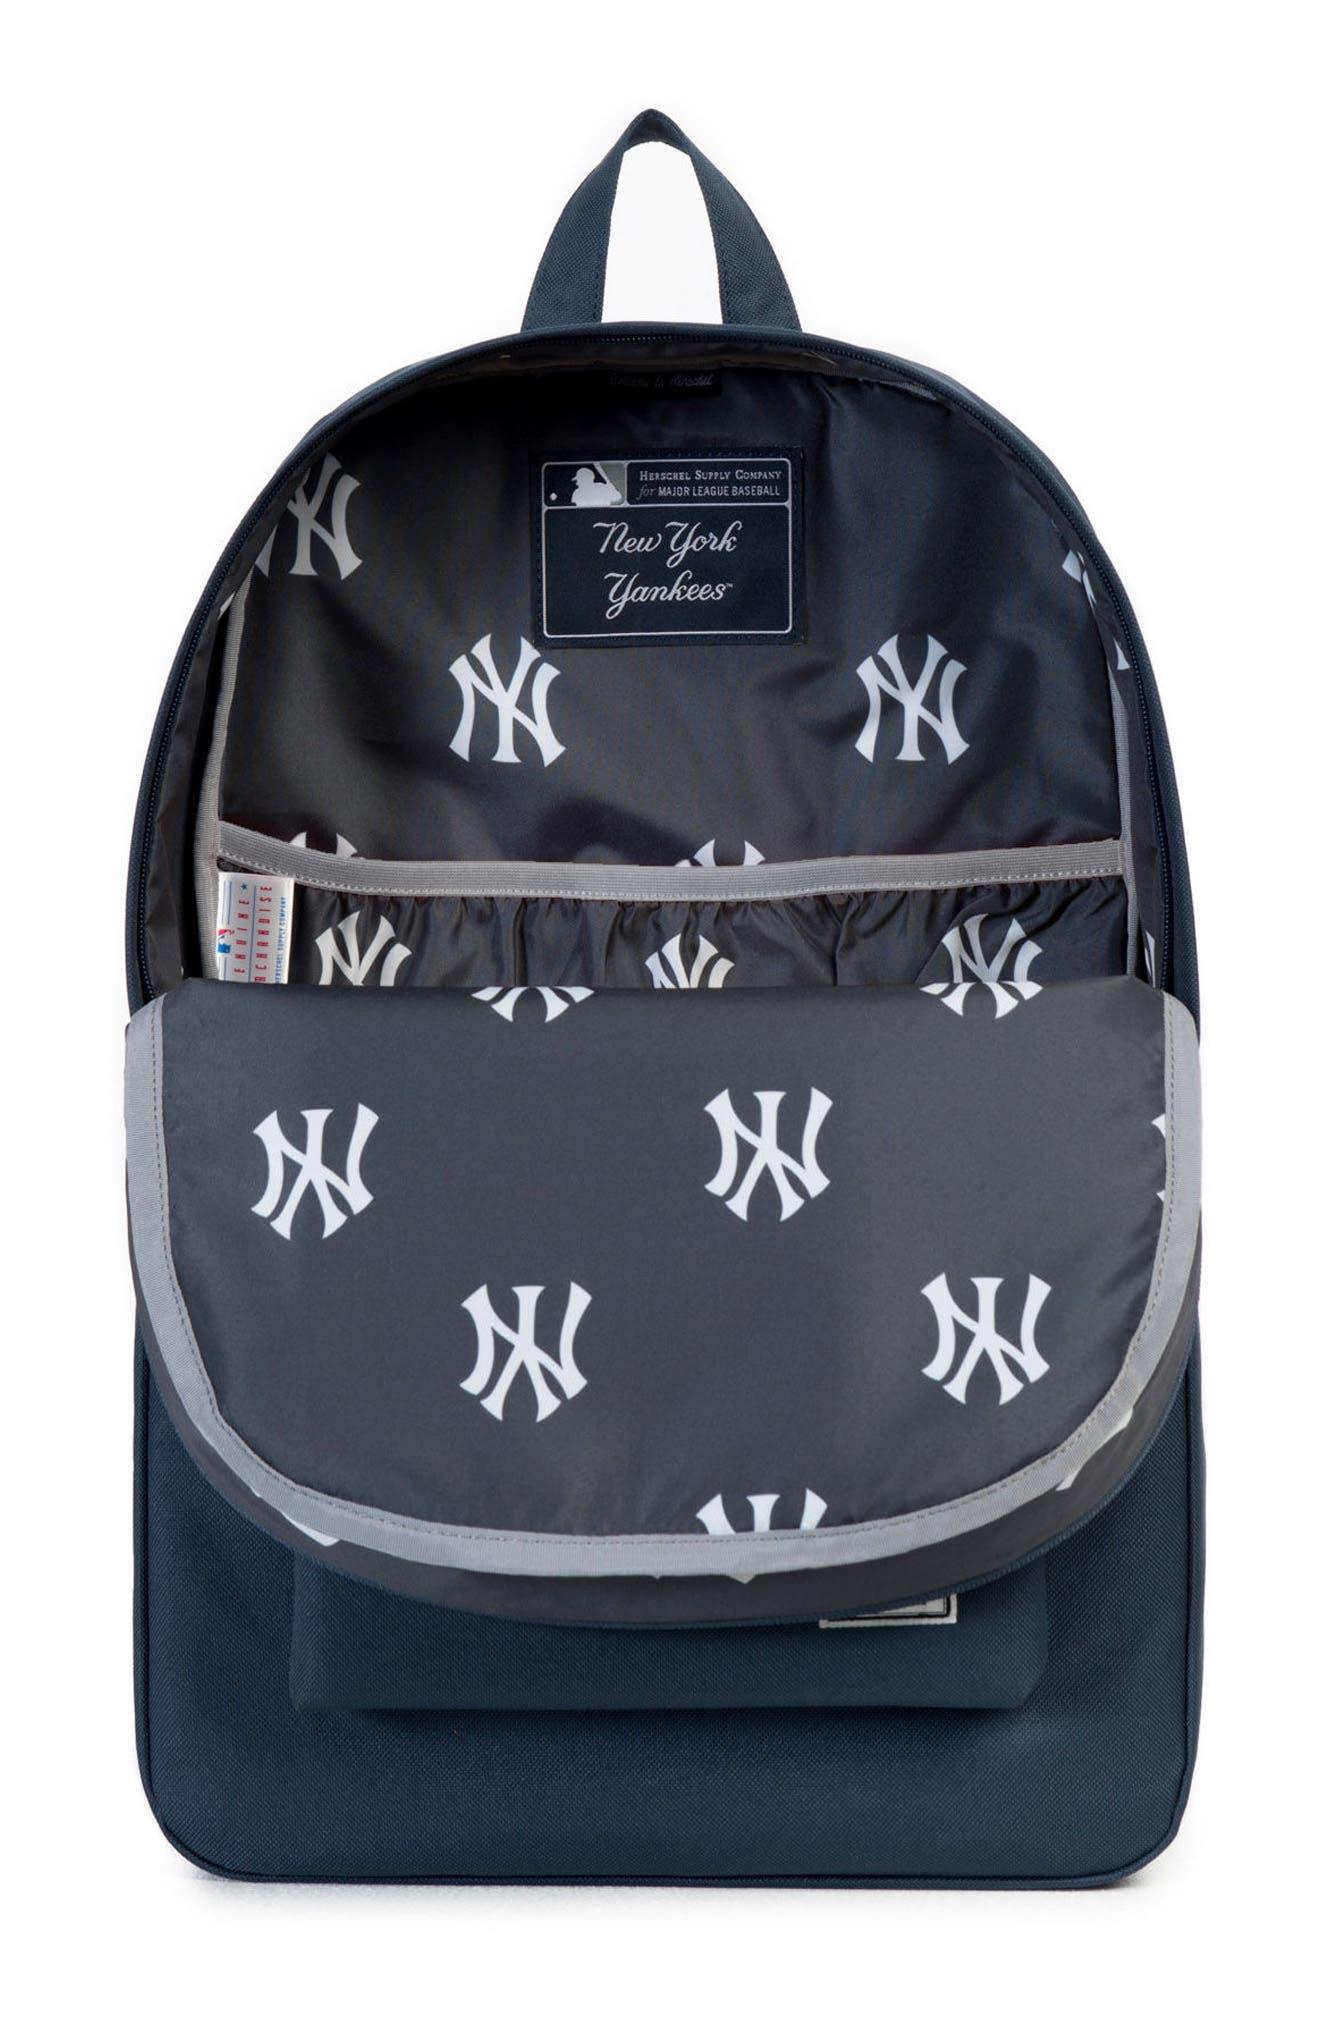 HERSCHEL SUPPLY CO.,                             Heritage New York Yankees Backpack,                             Alternate thumbnail 3, color,                             NEW YORK YANKEES